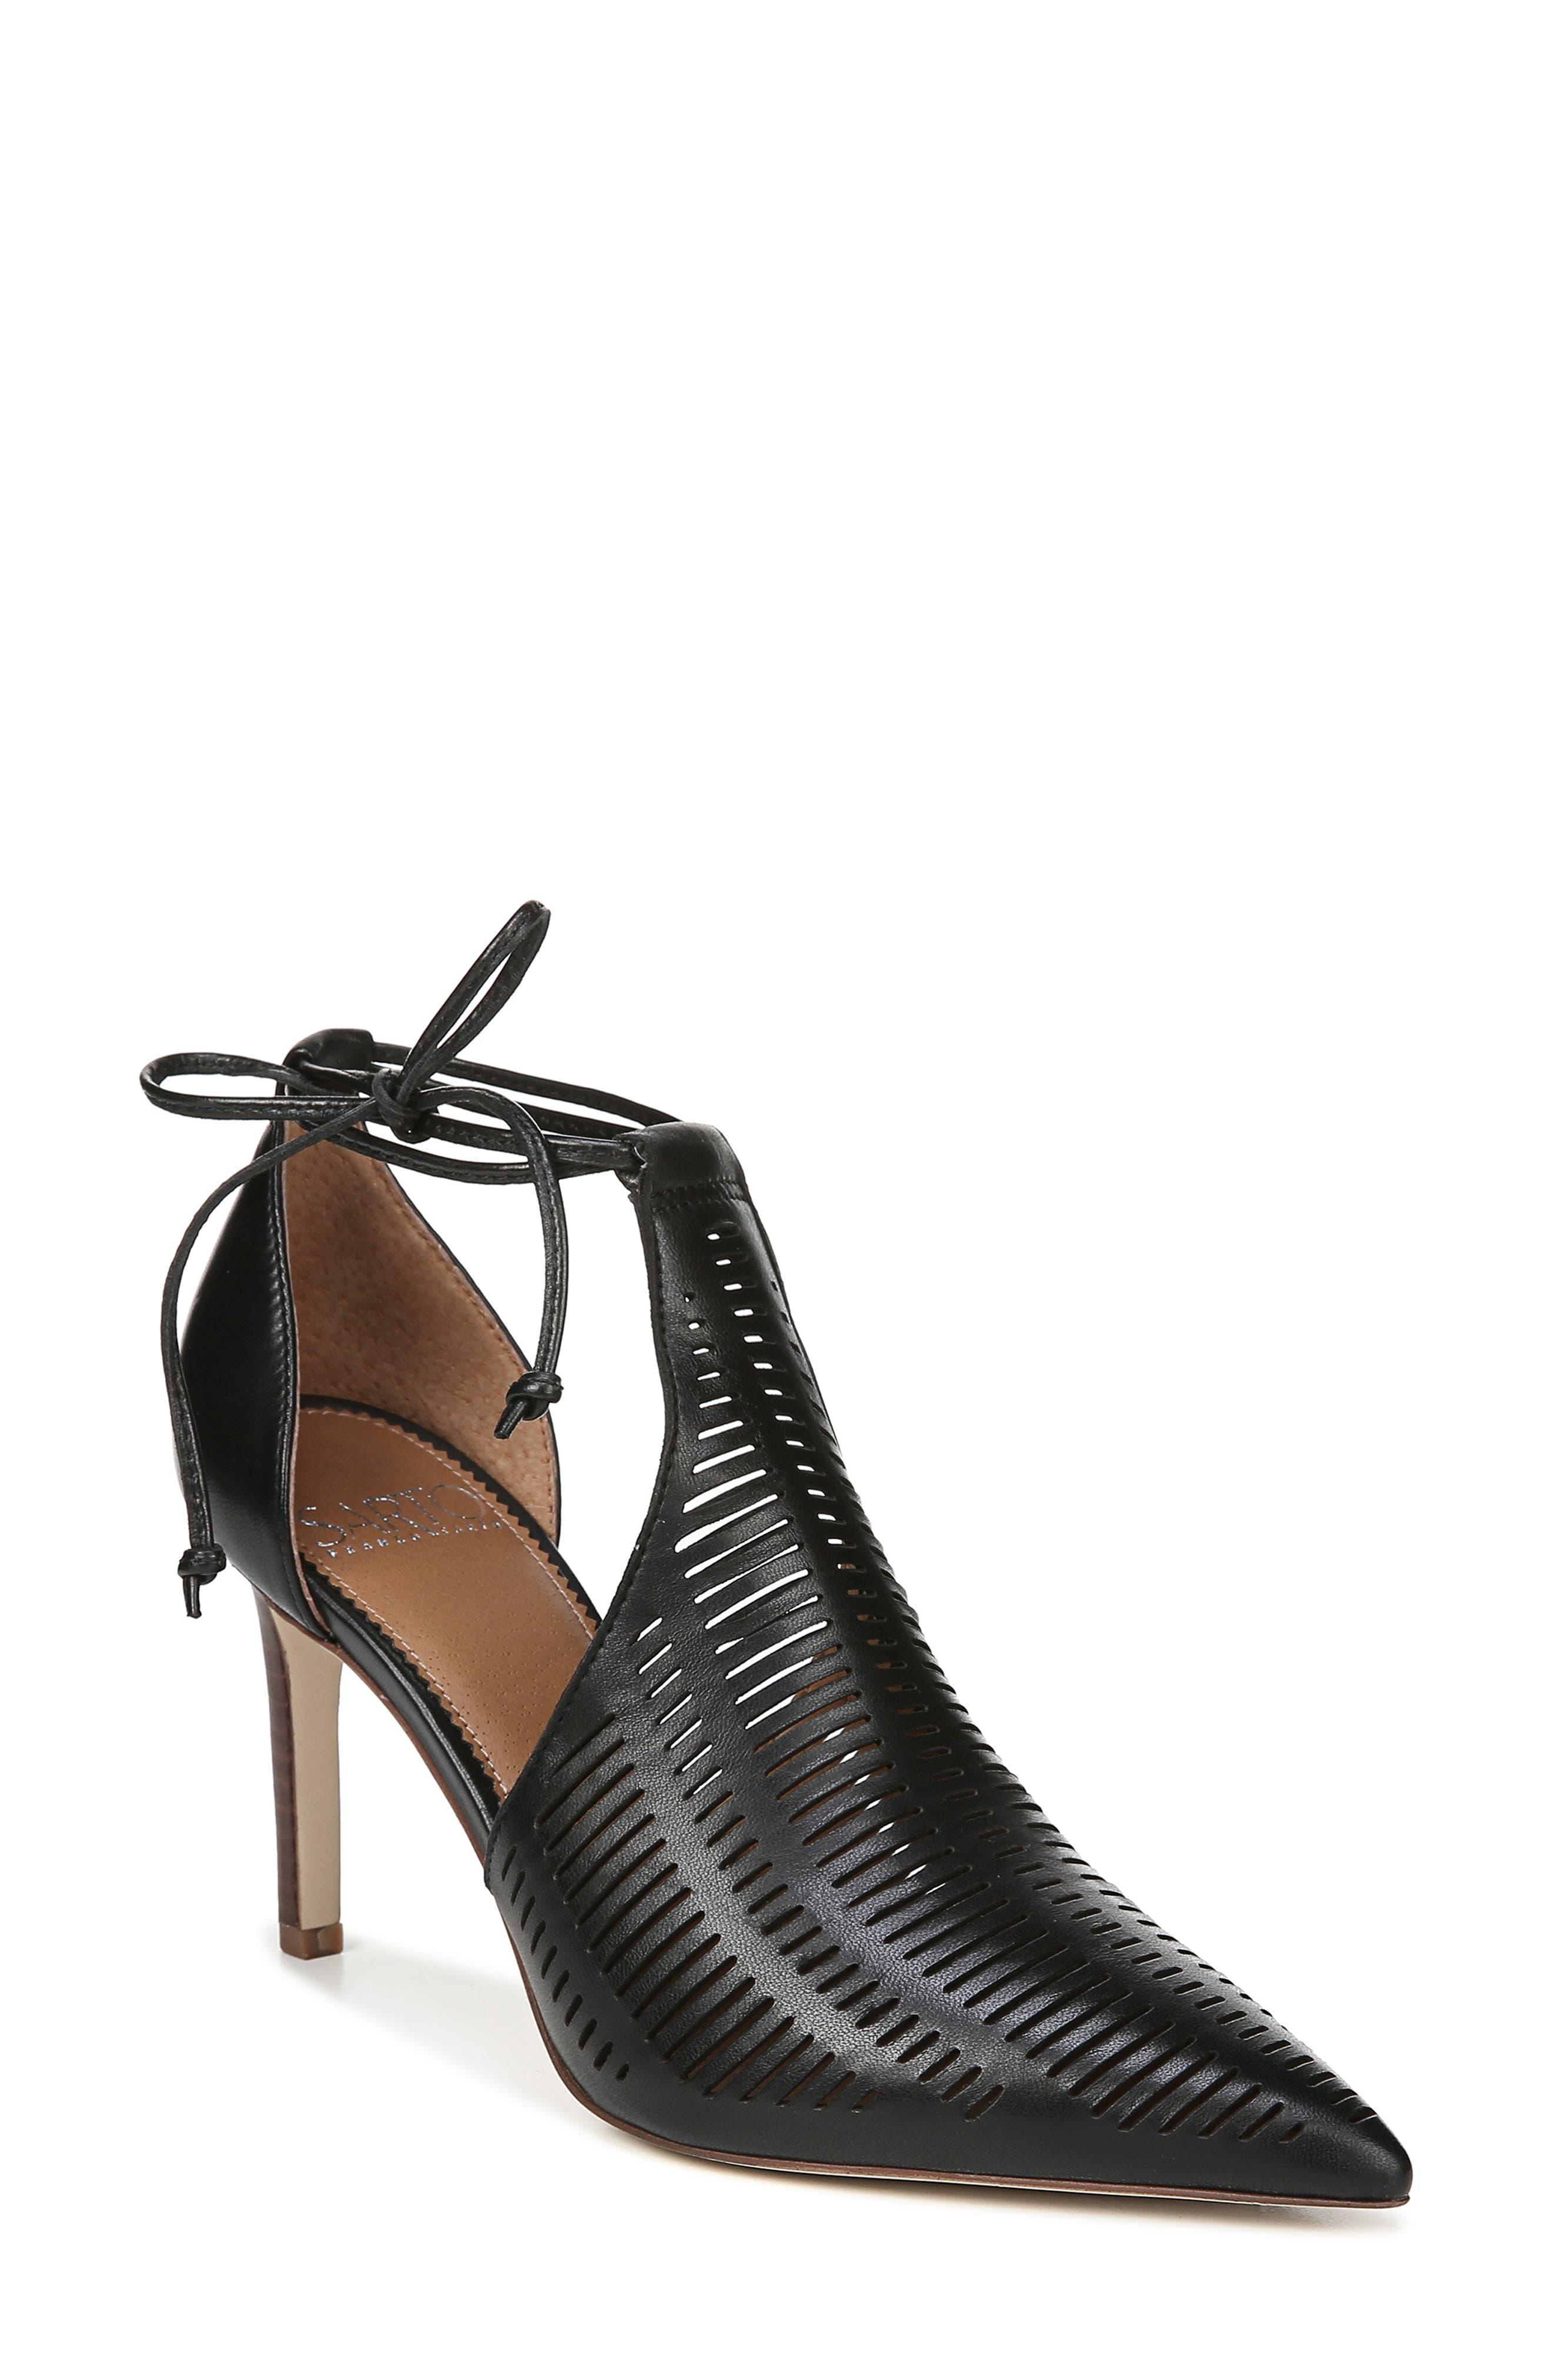 Sarto By Franco Sarto Krista Perforated Ankle Wrap Pump- Black